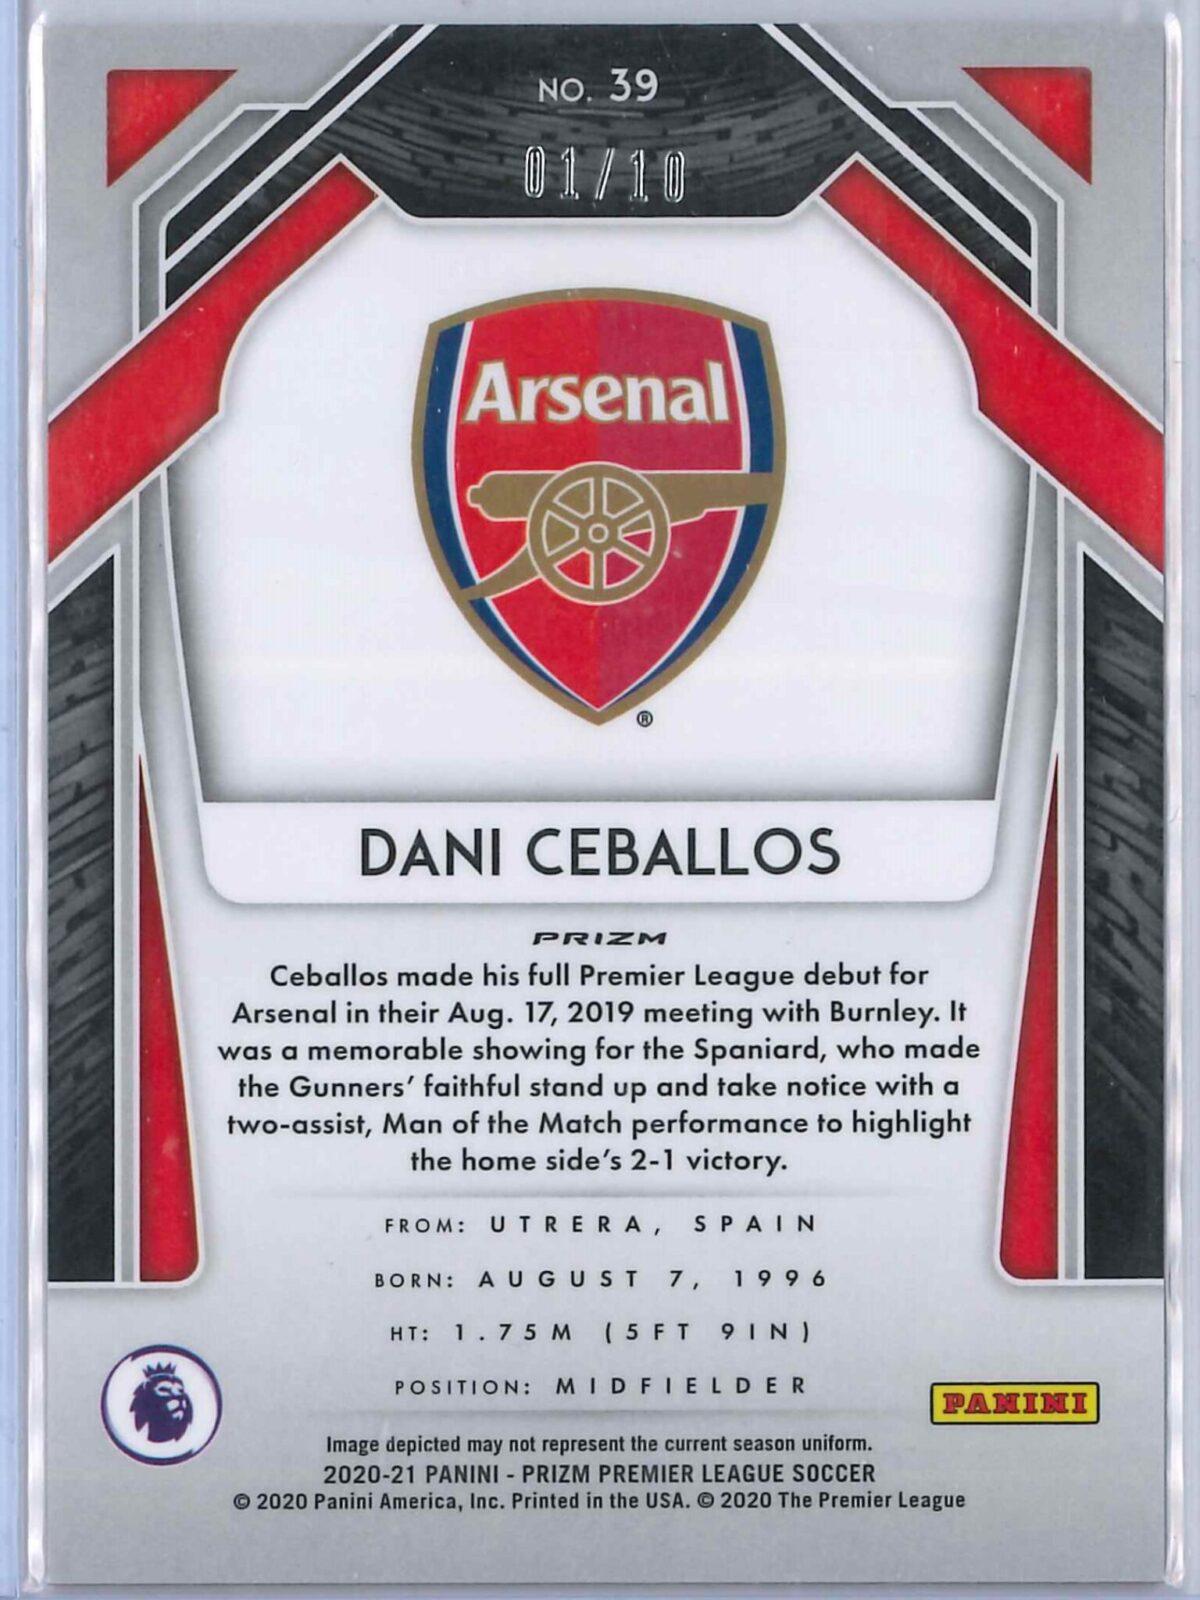 Dani Ceballos Panini Prizm 2020-21 Base Gold 01/10